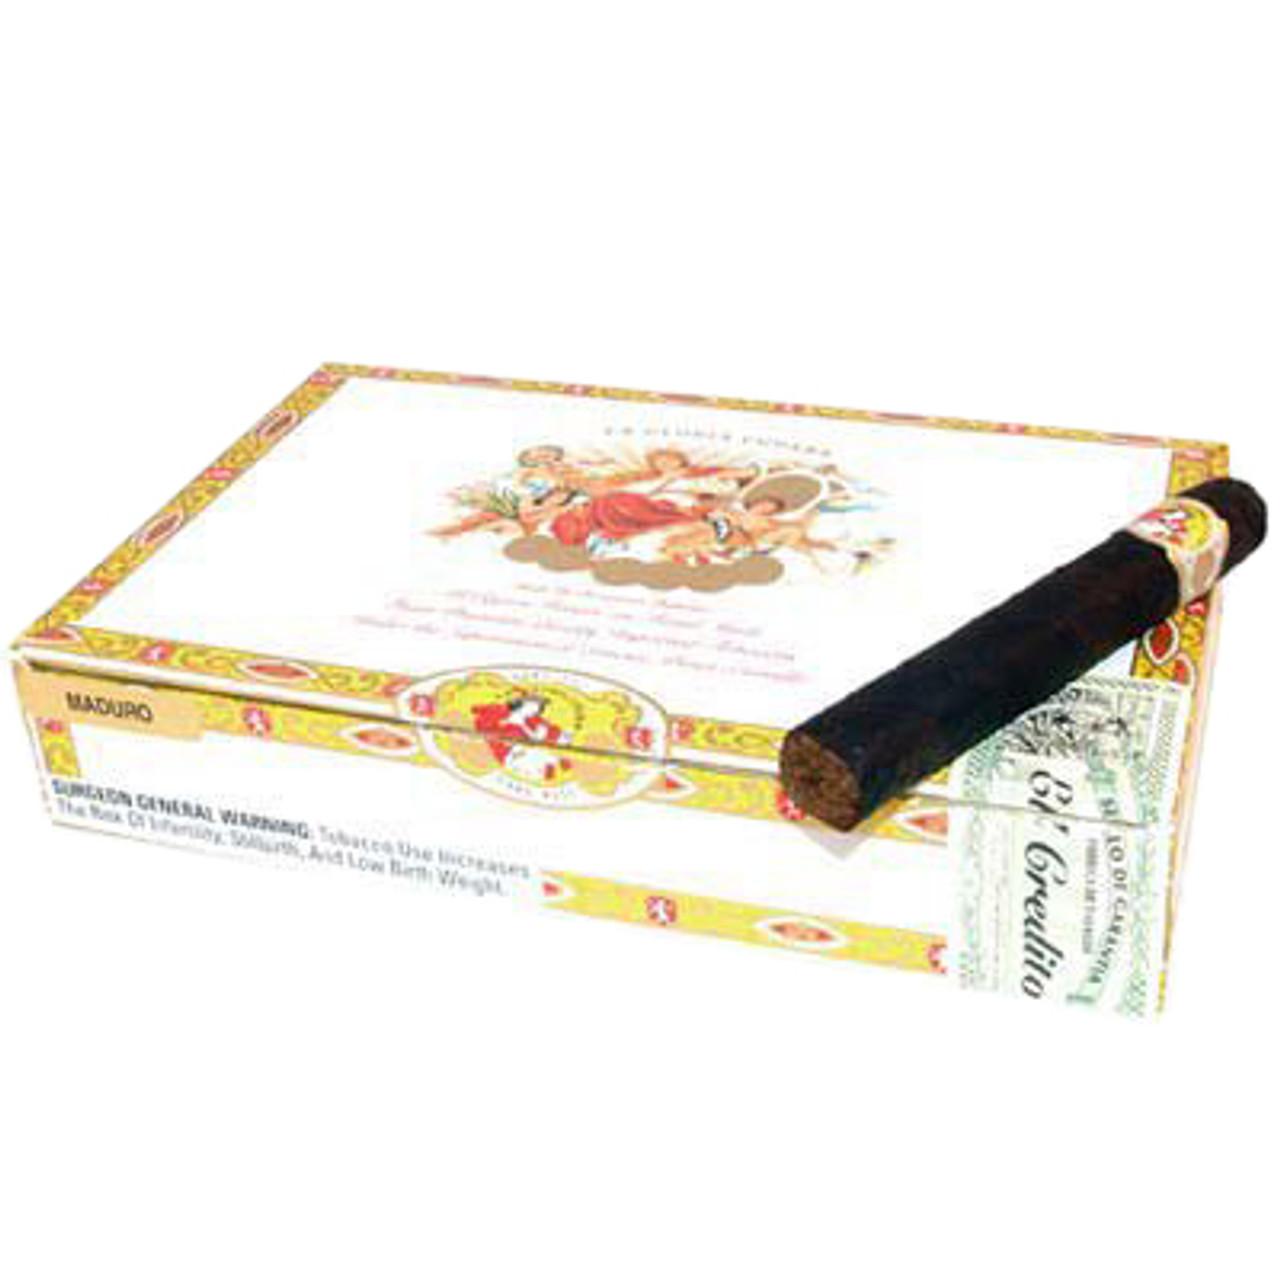 La Gloria Cubana Soberano Maduro Cigars - 8 x 52 (Box of 25)